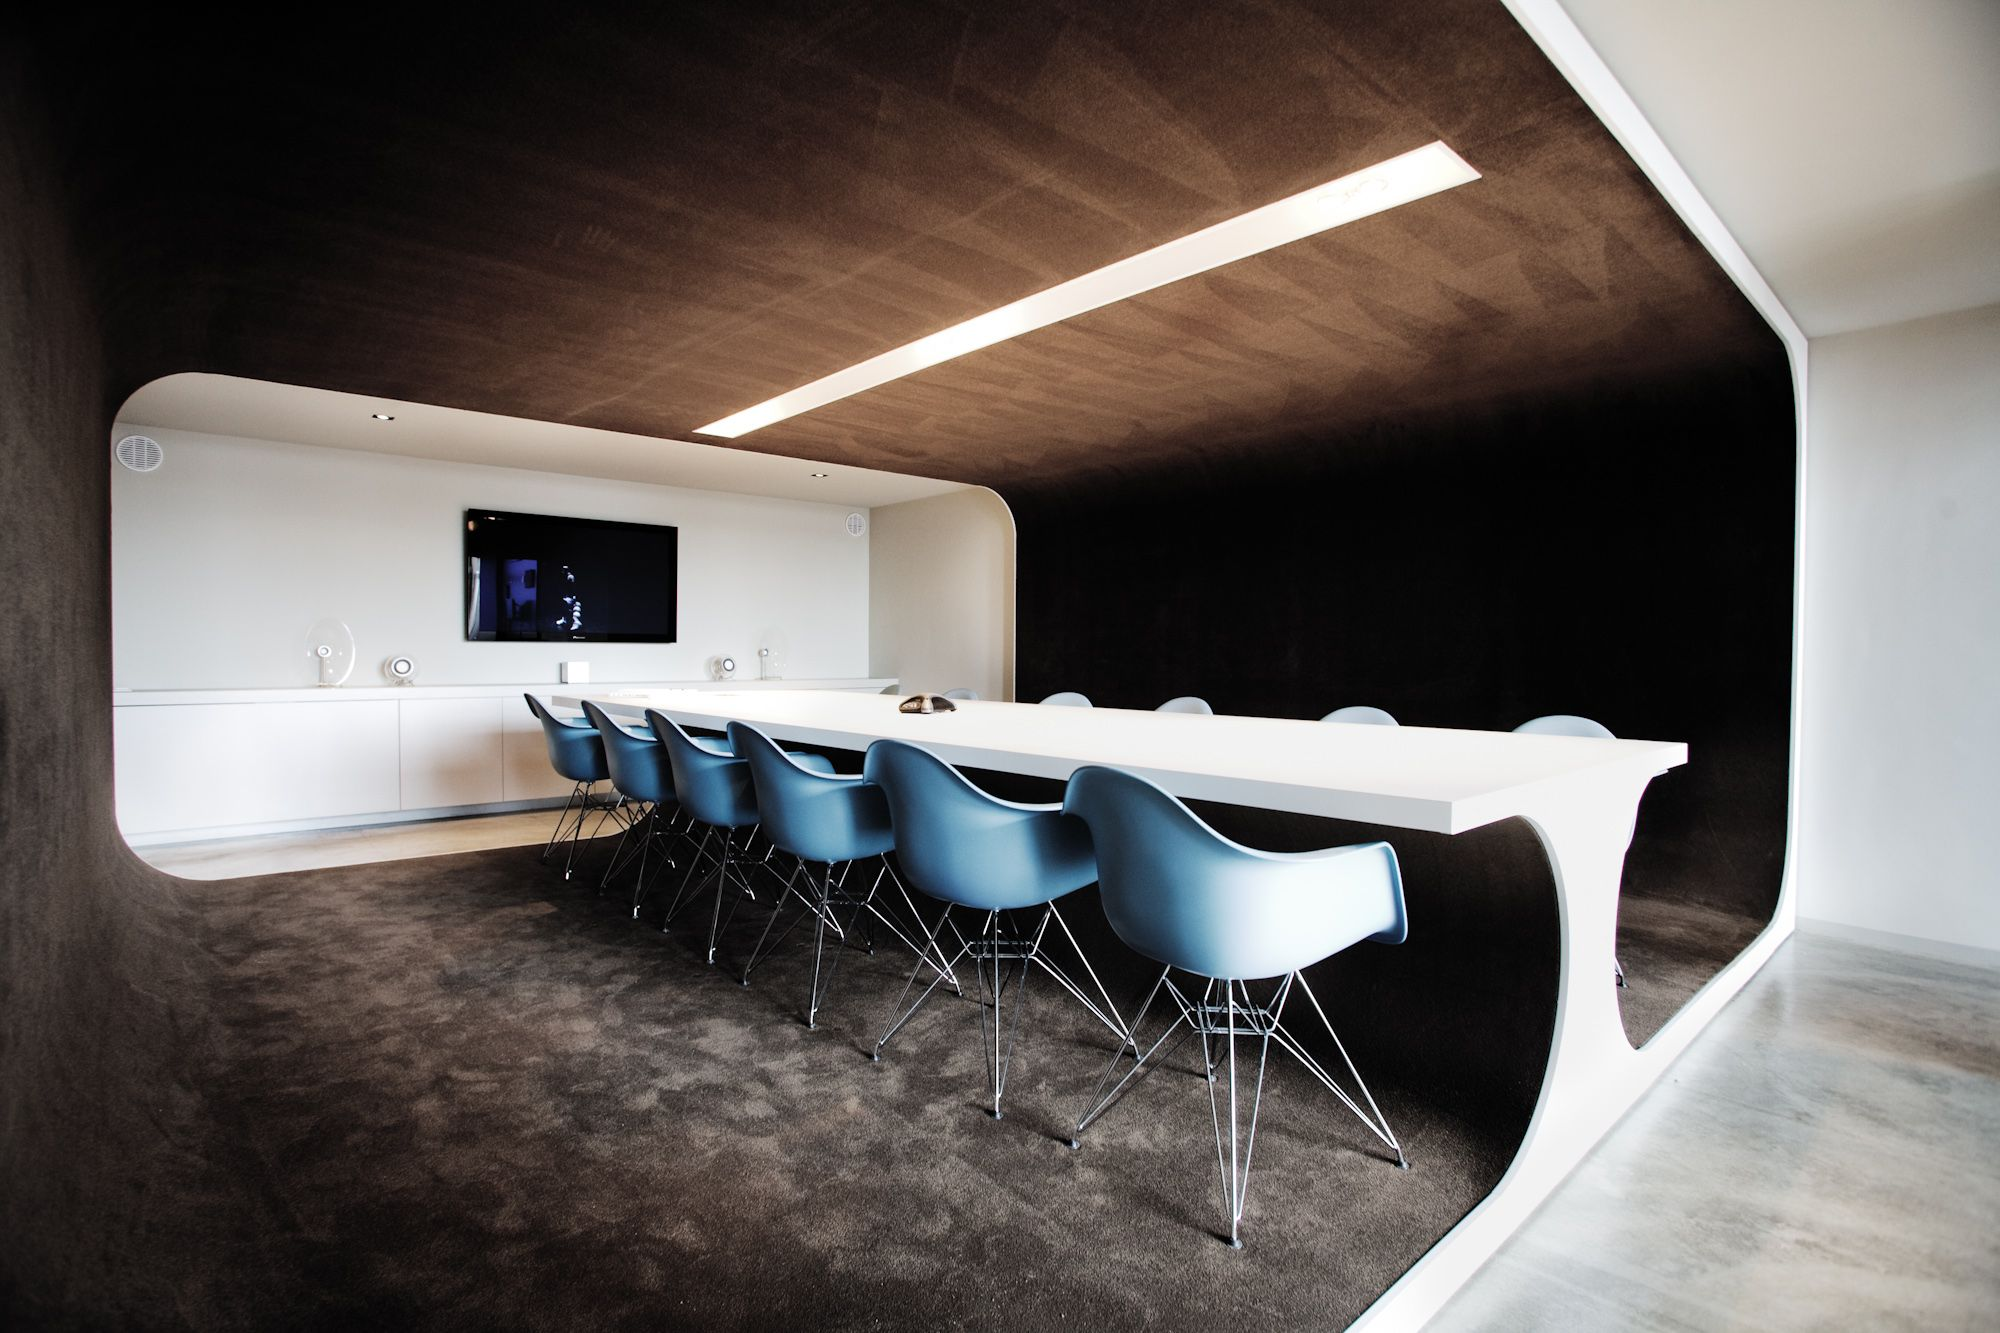 Postpanic Production Company In Amsterdam Office Interior Design Www Pinterest Com Seeyond Office Interior Design Office Space Design Interior Design